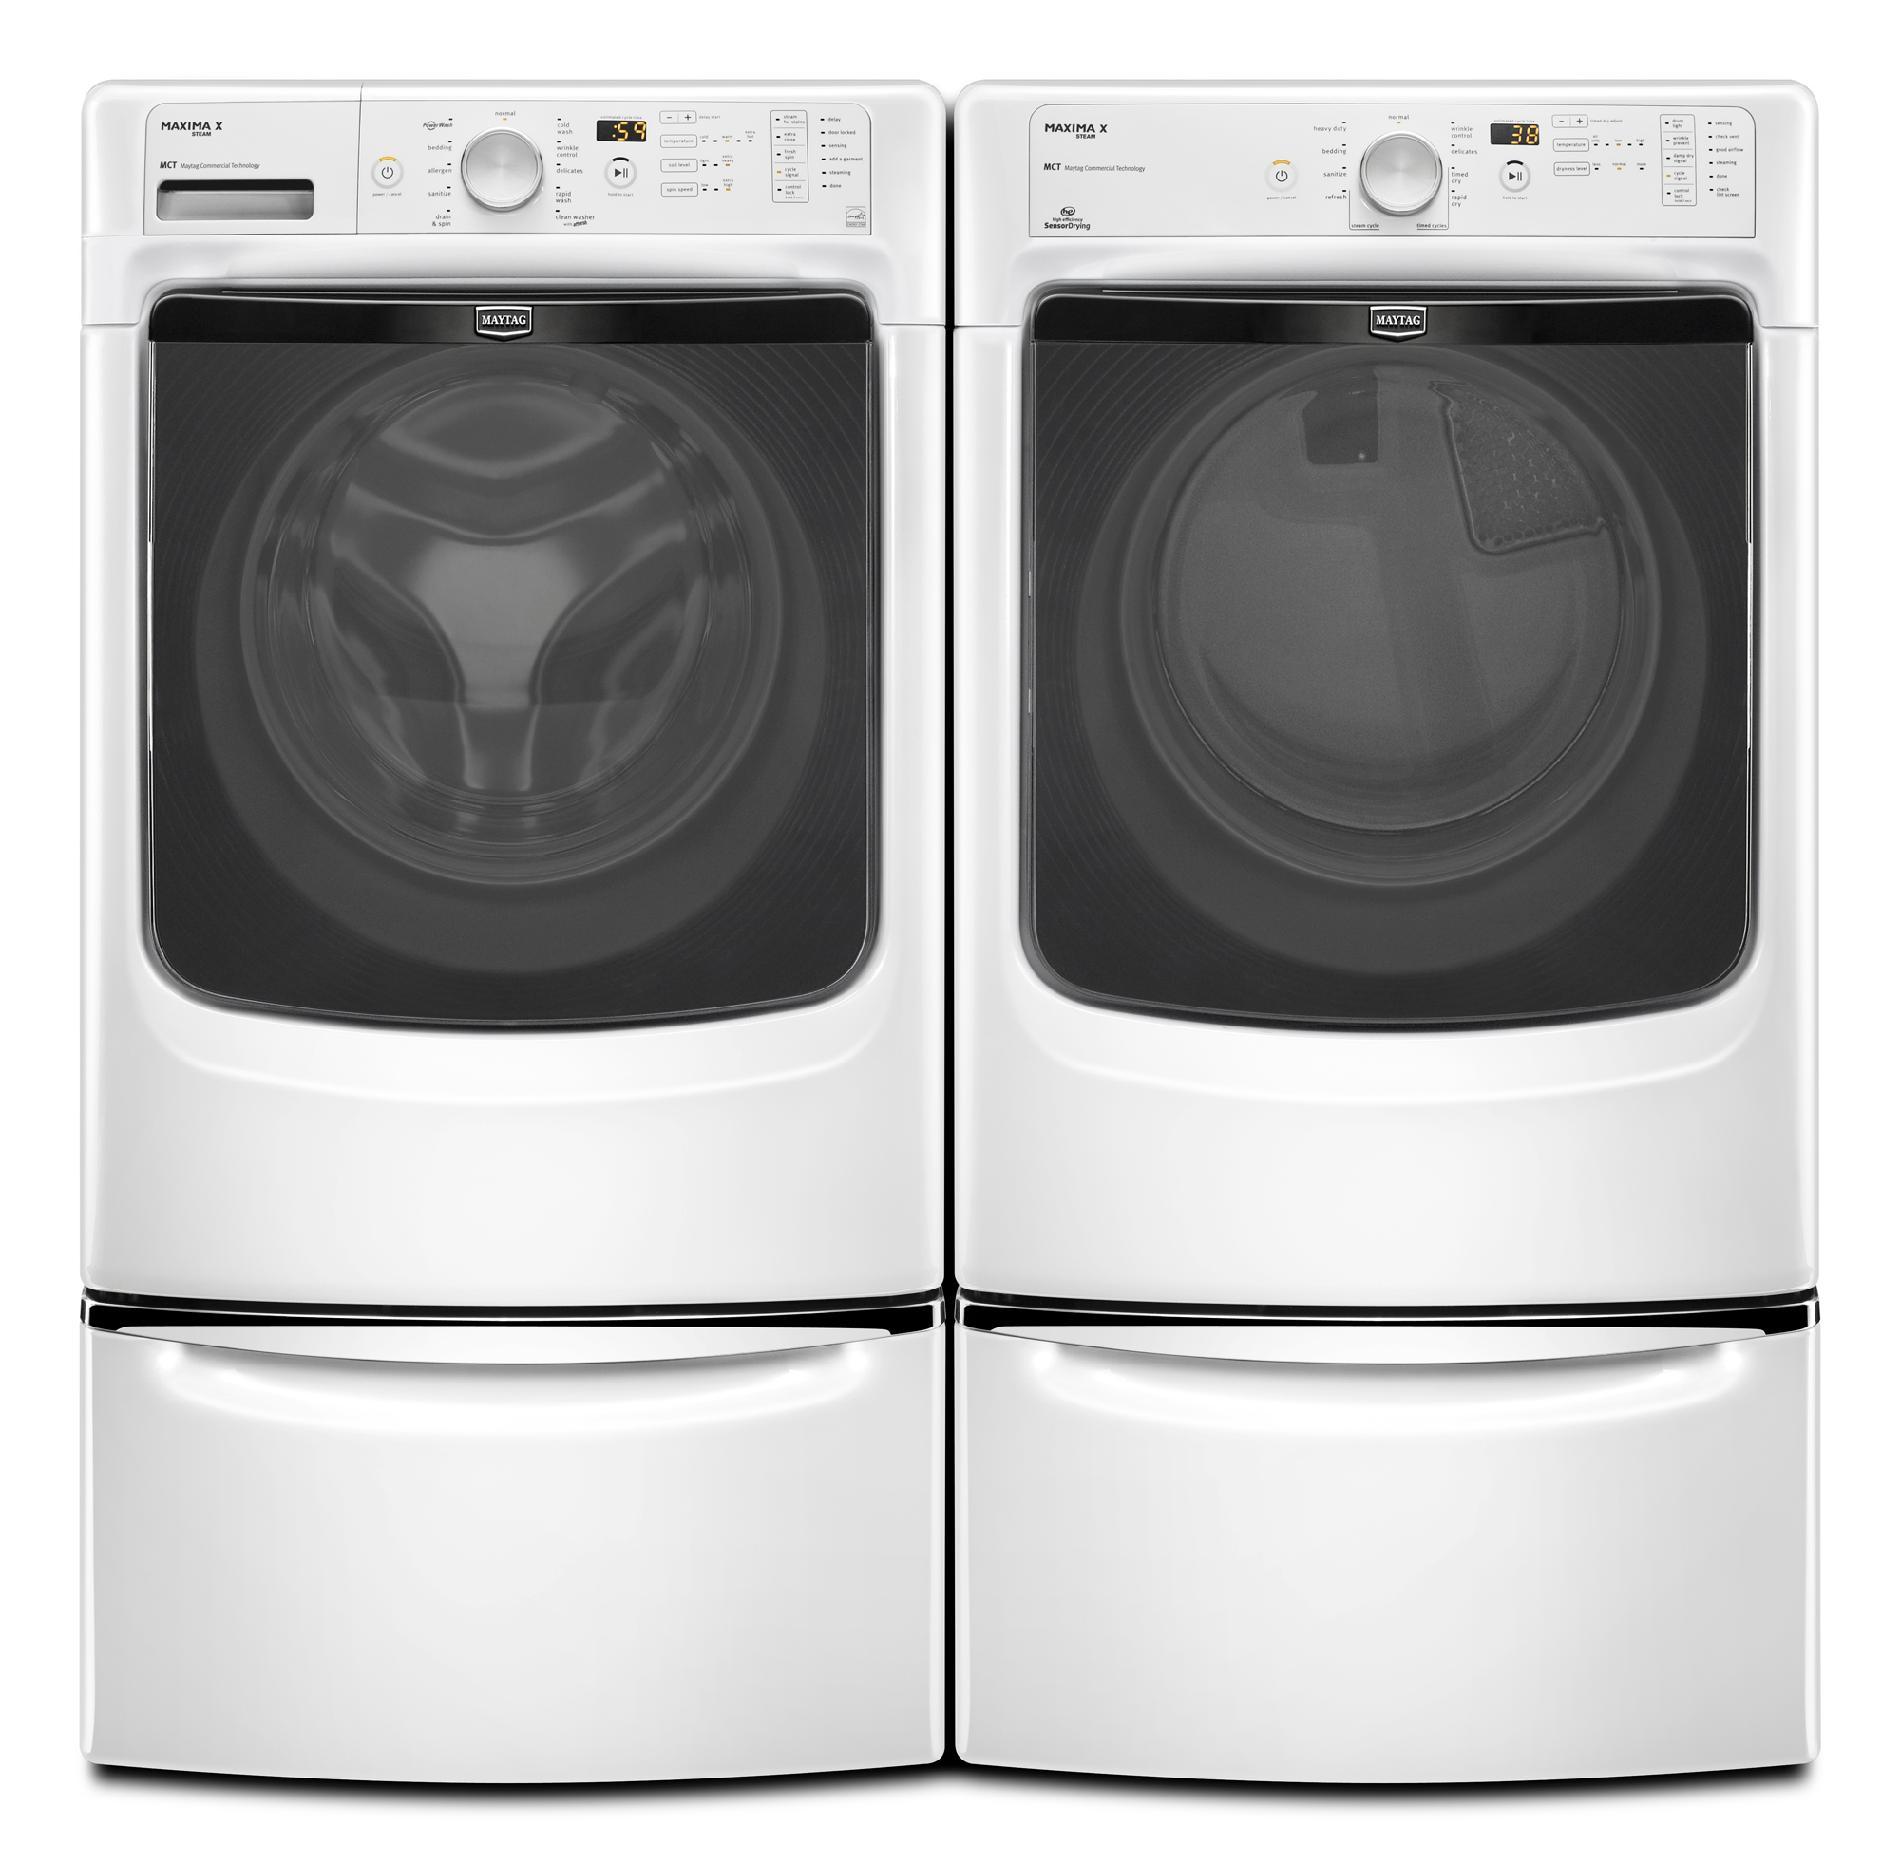 Maytag 7.4 cu. ft. Gas Dryer w/ Steam - White